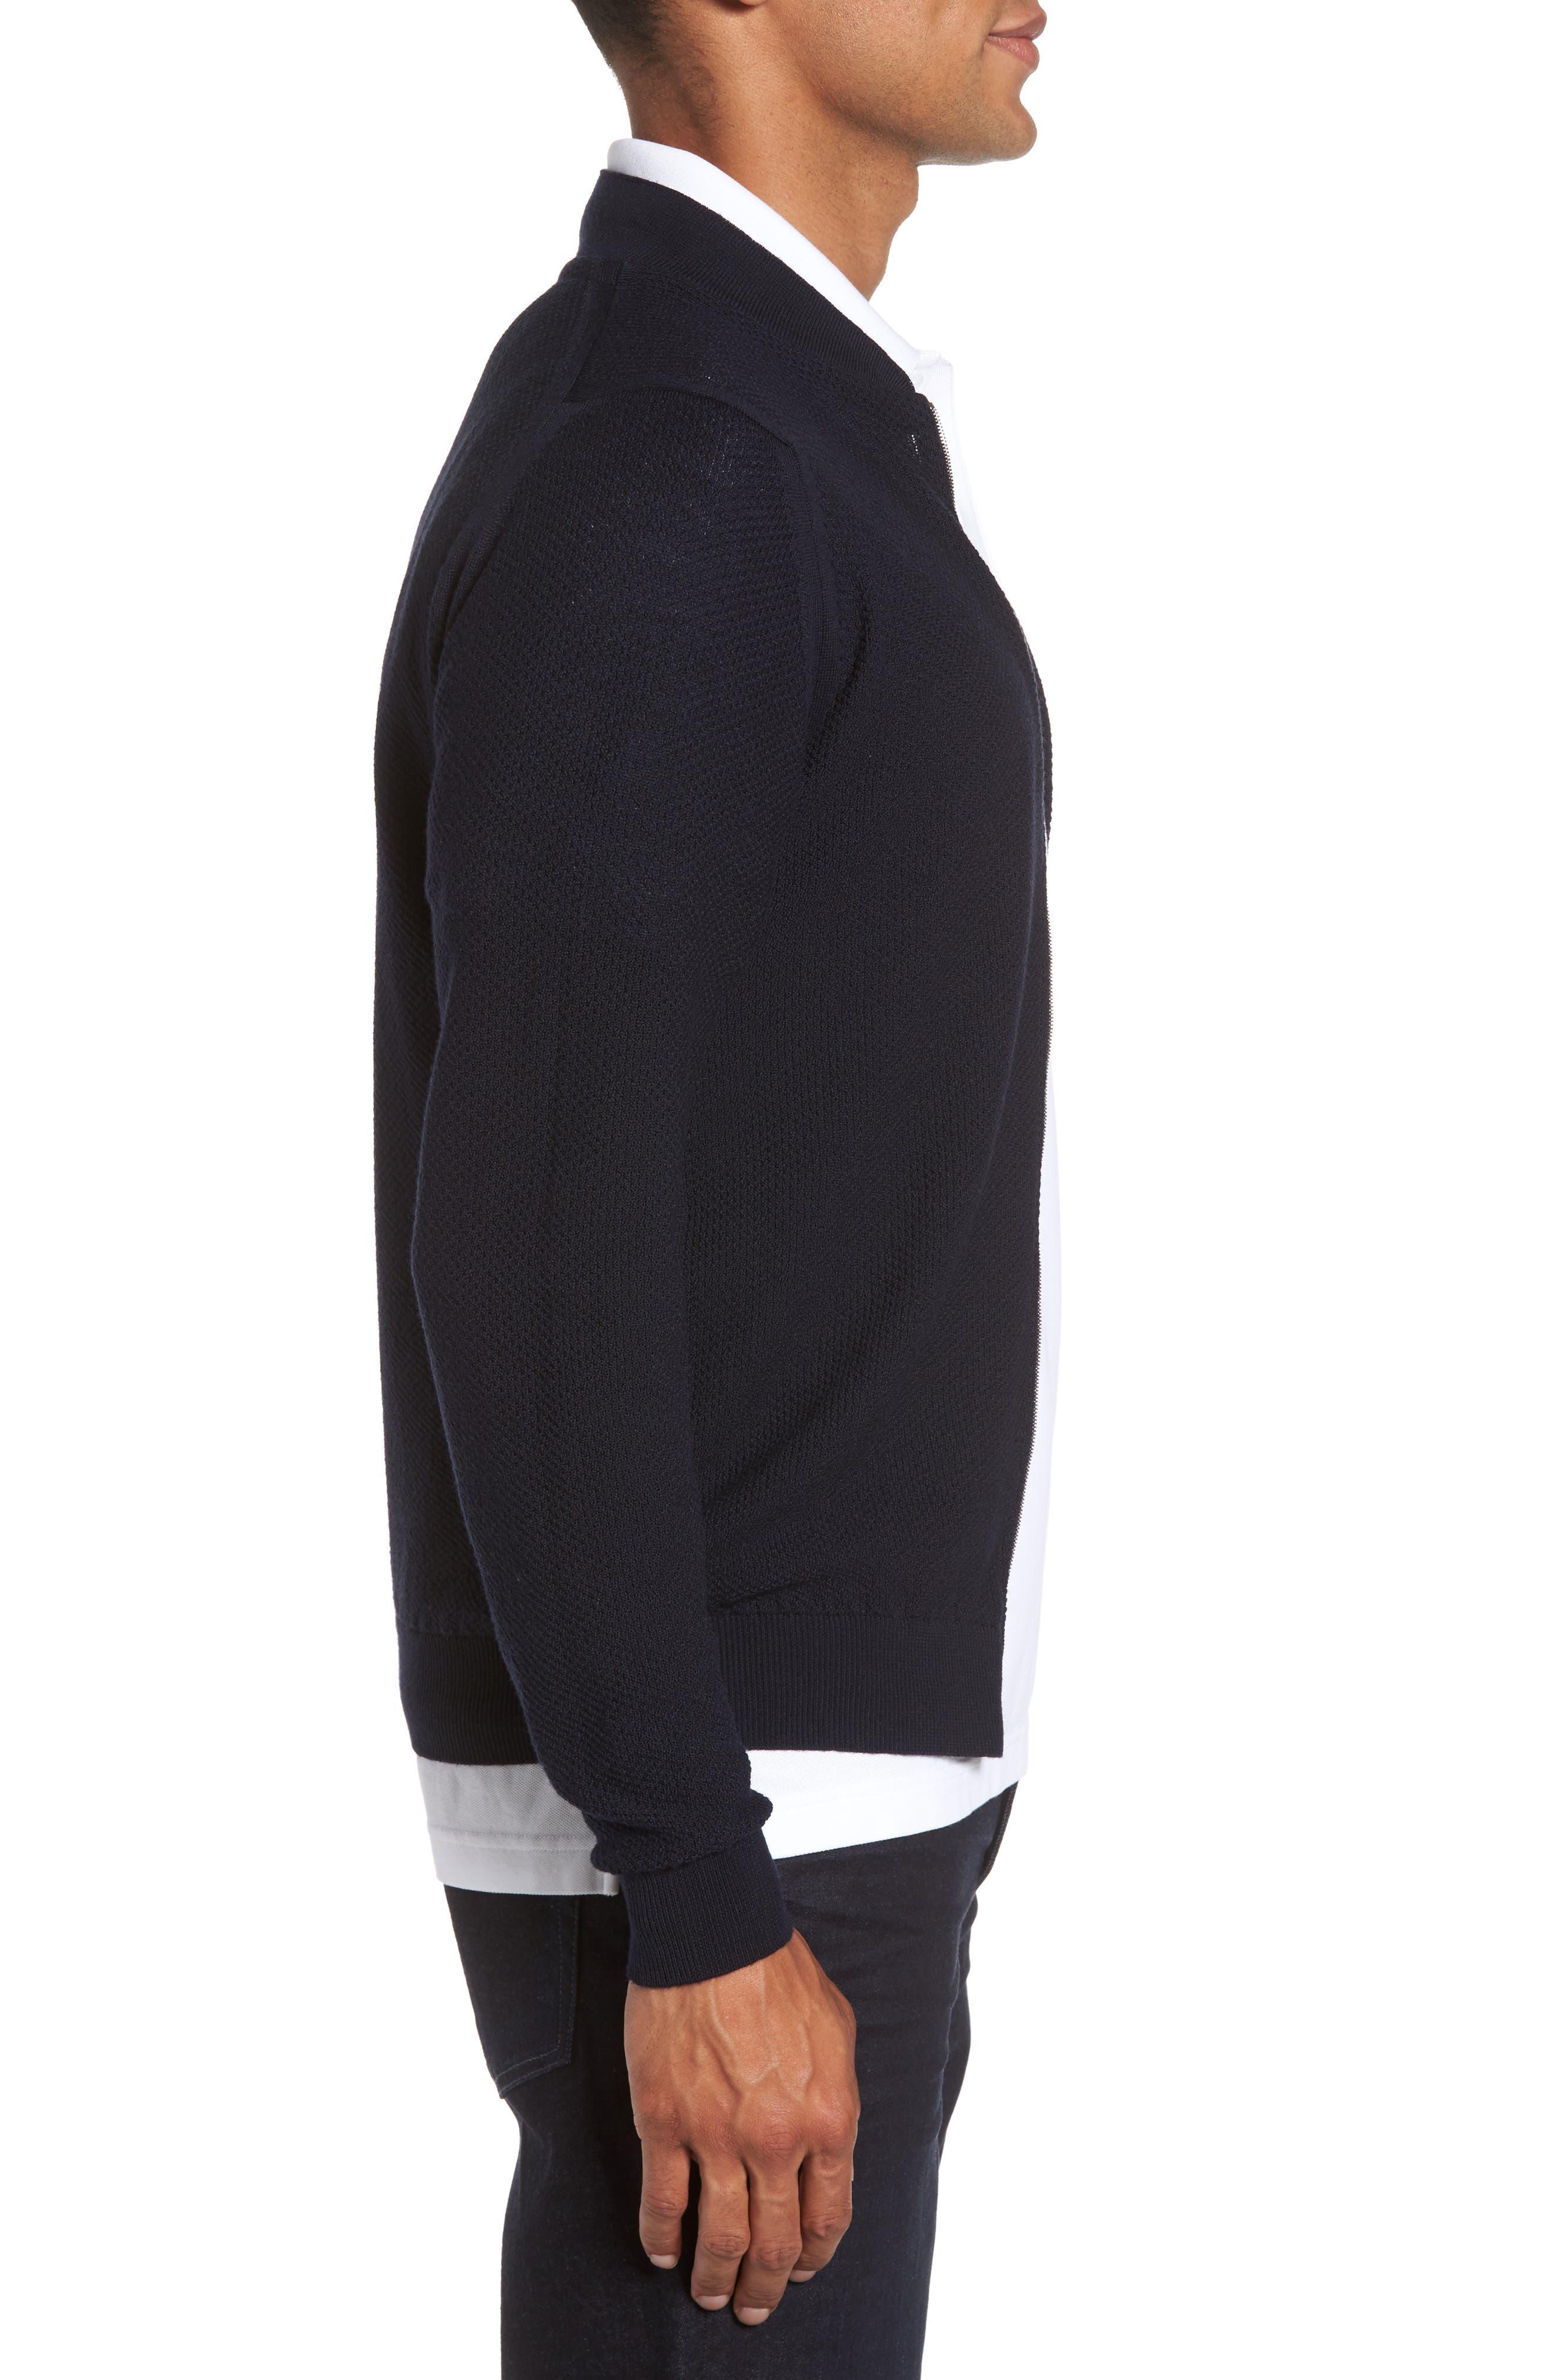 Alternate Image 3  - John Smedley Standard Fit Merino Wool Knit Jacket